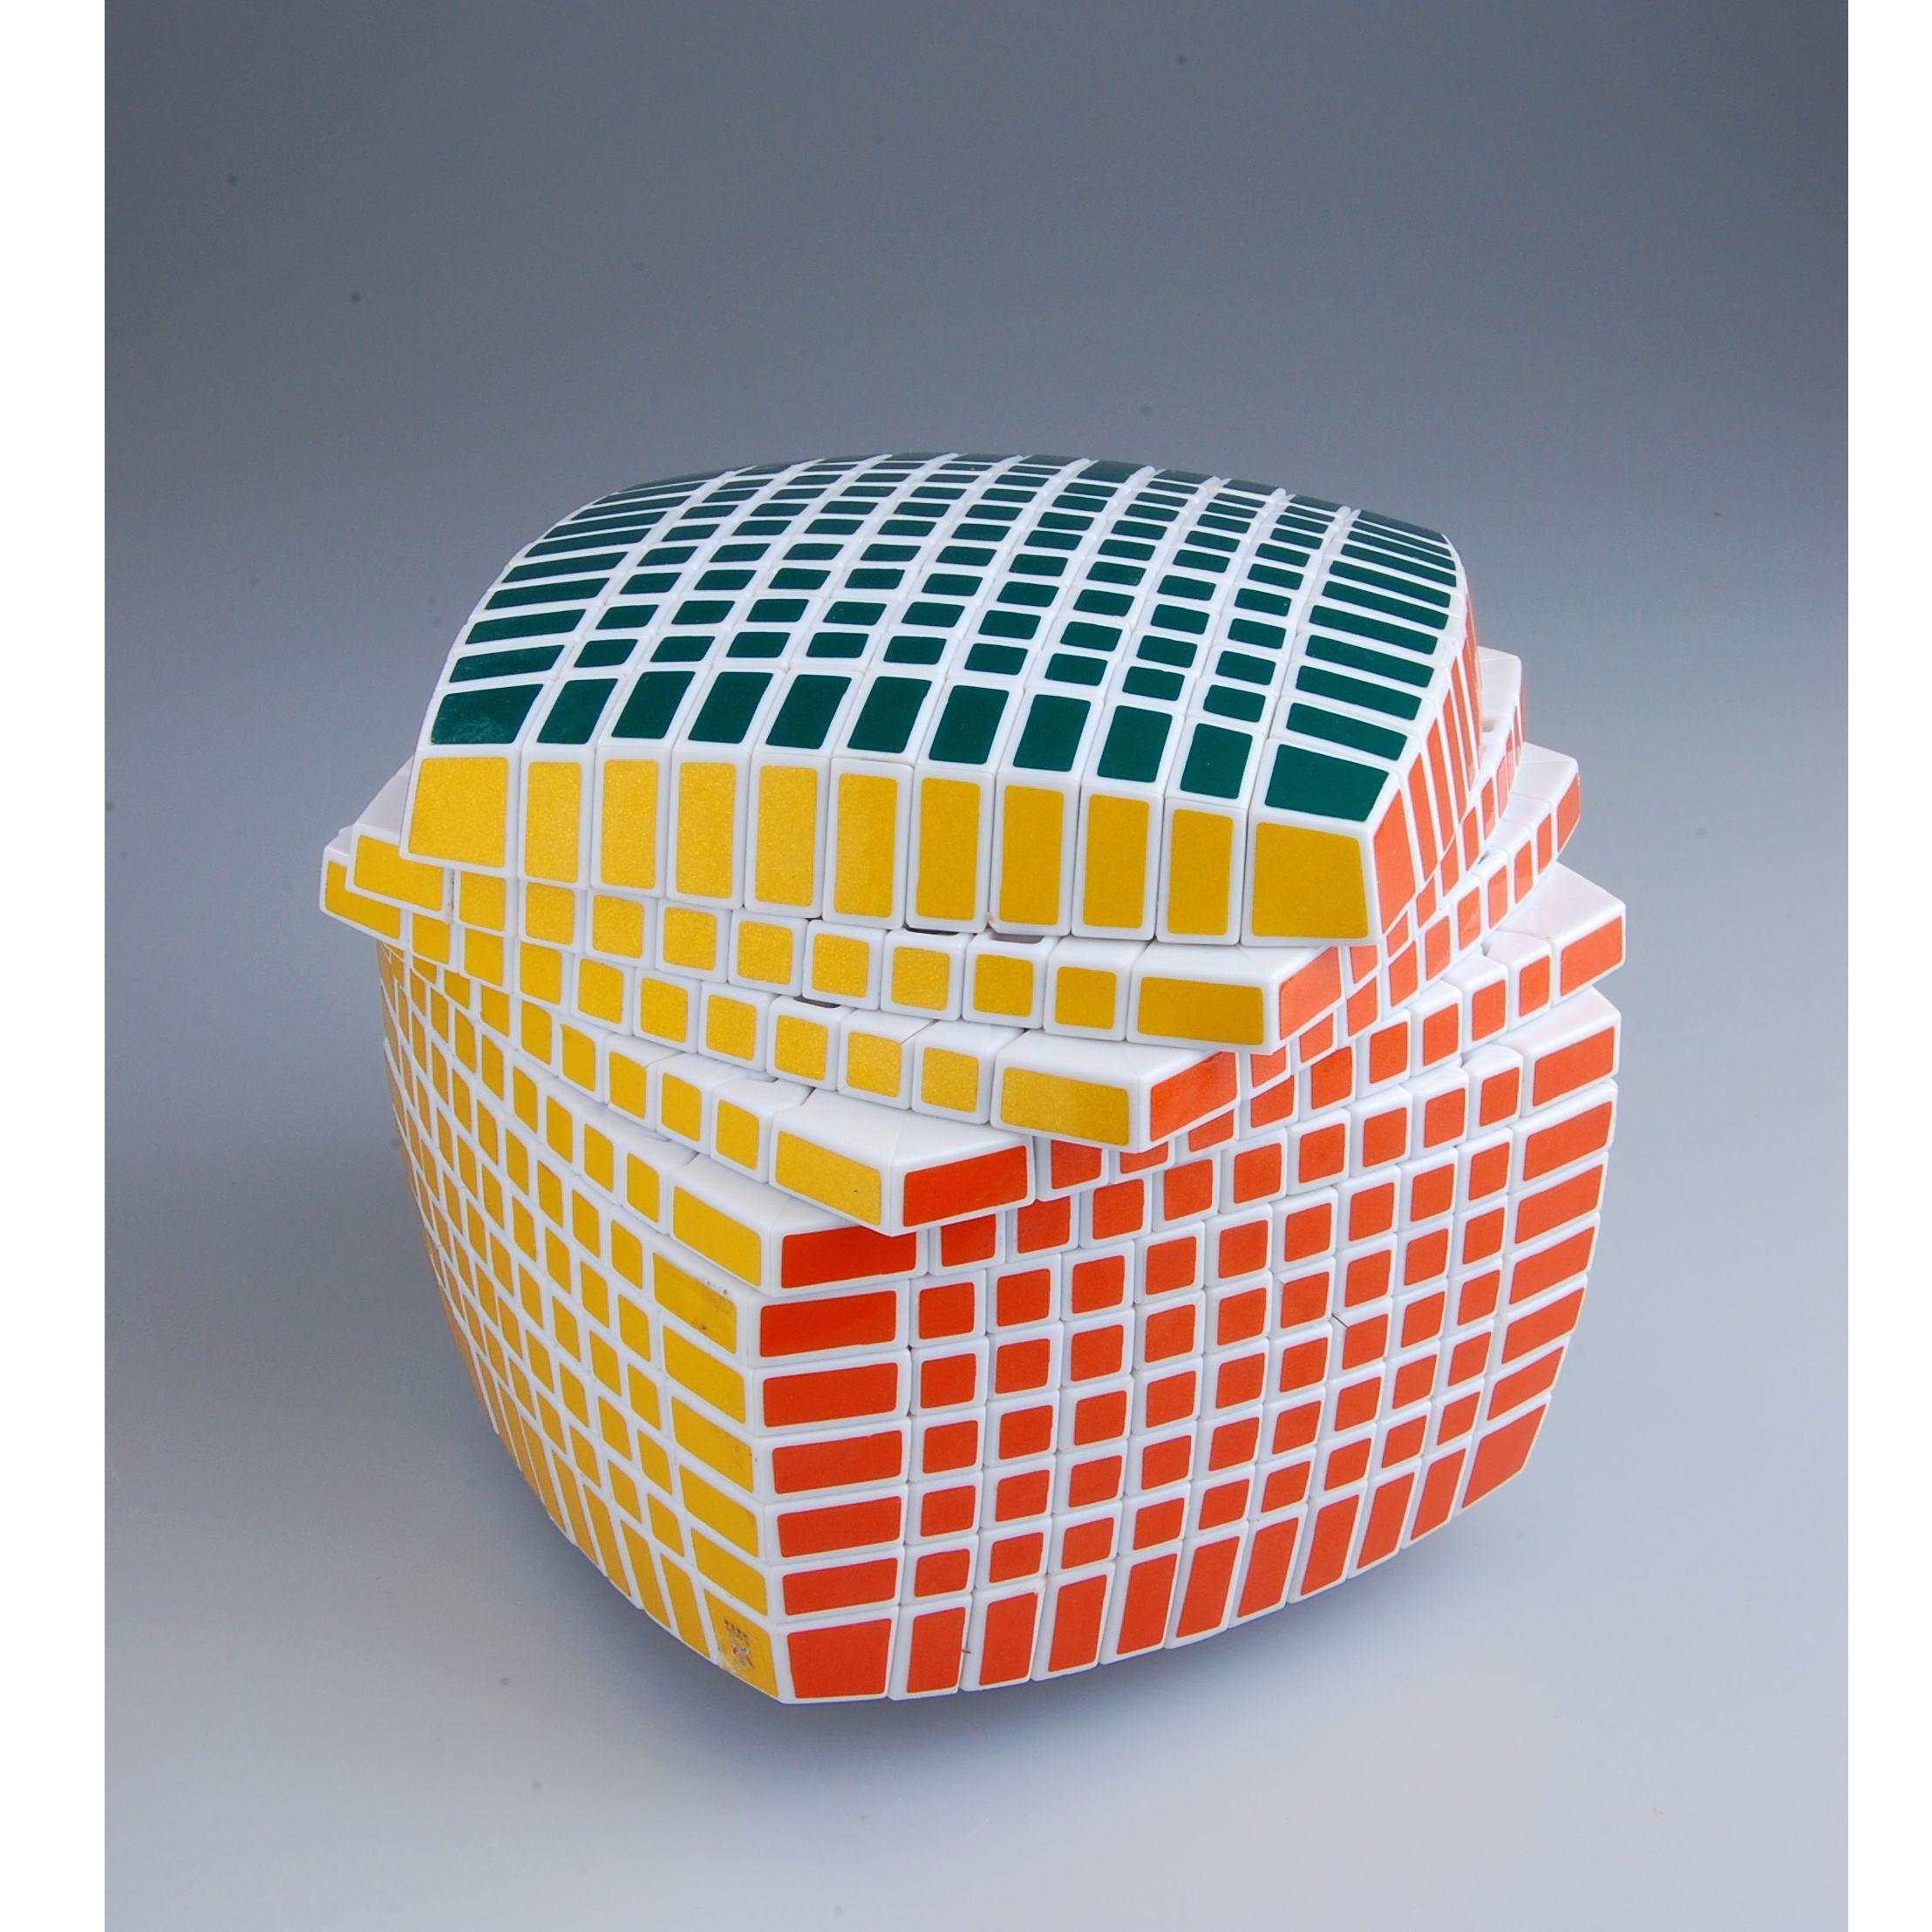 Yuxin 11x11 Magic Cube Puzzle White Http Www Eachbyte Com Yuxin 11x11x11 White Html Outdoor Decor Outdoor Ottoman Decor